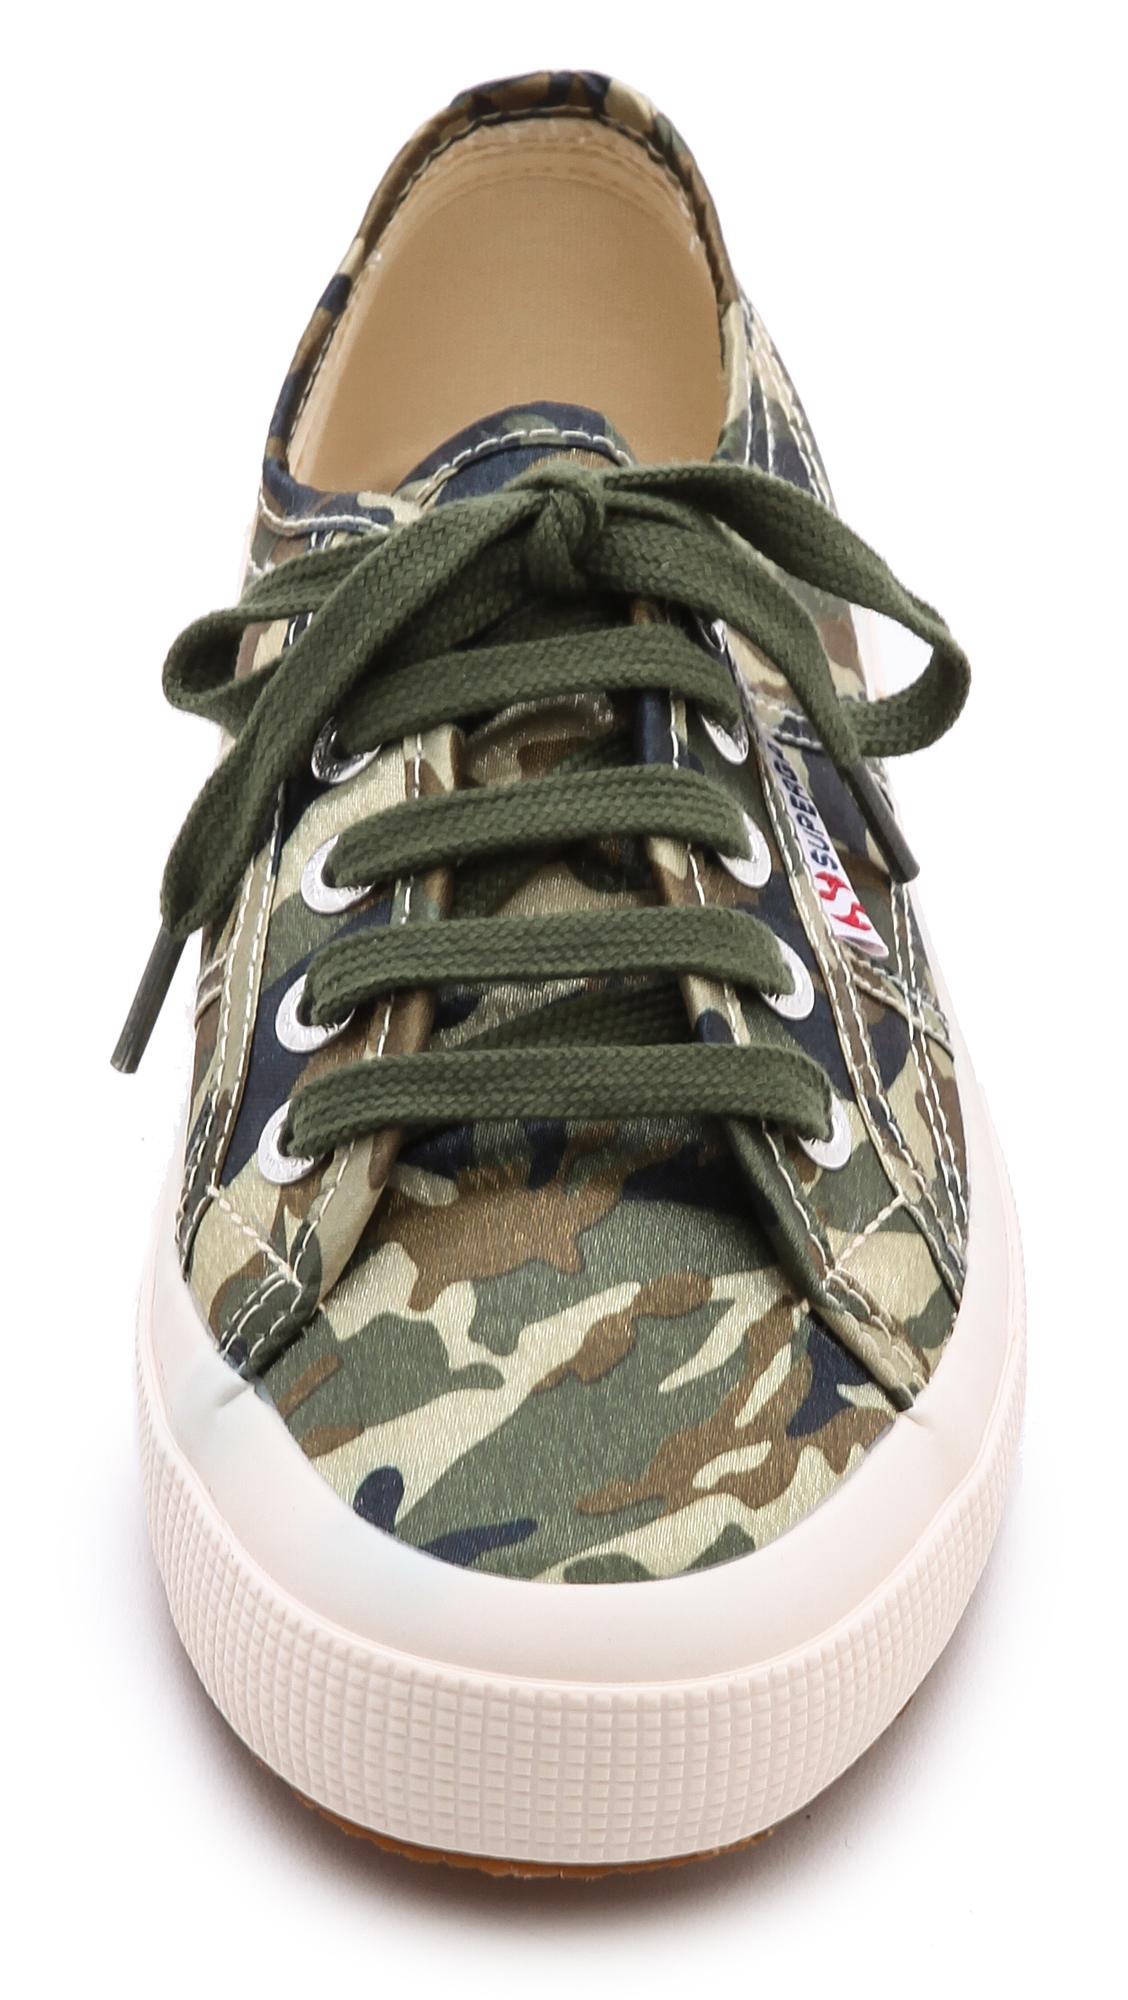 Superga Camo Cotu Sneakers | SHOPBOP